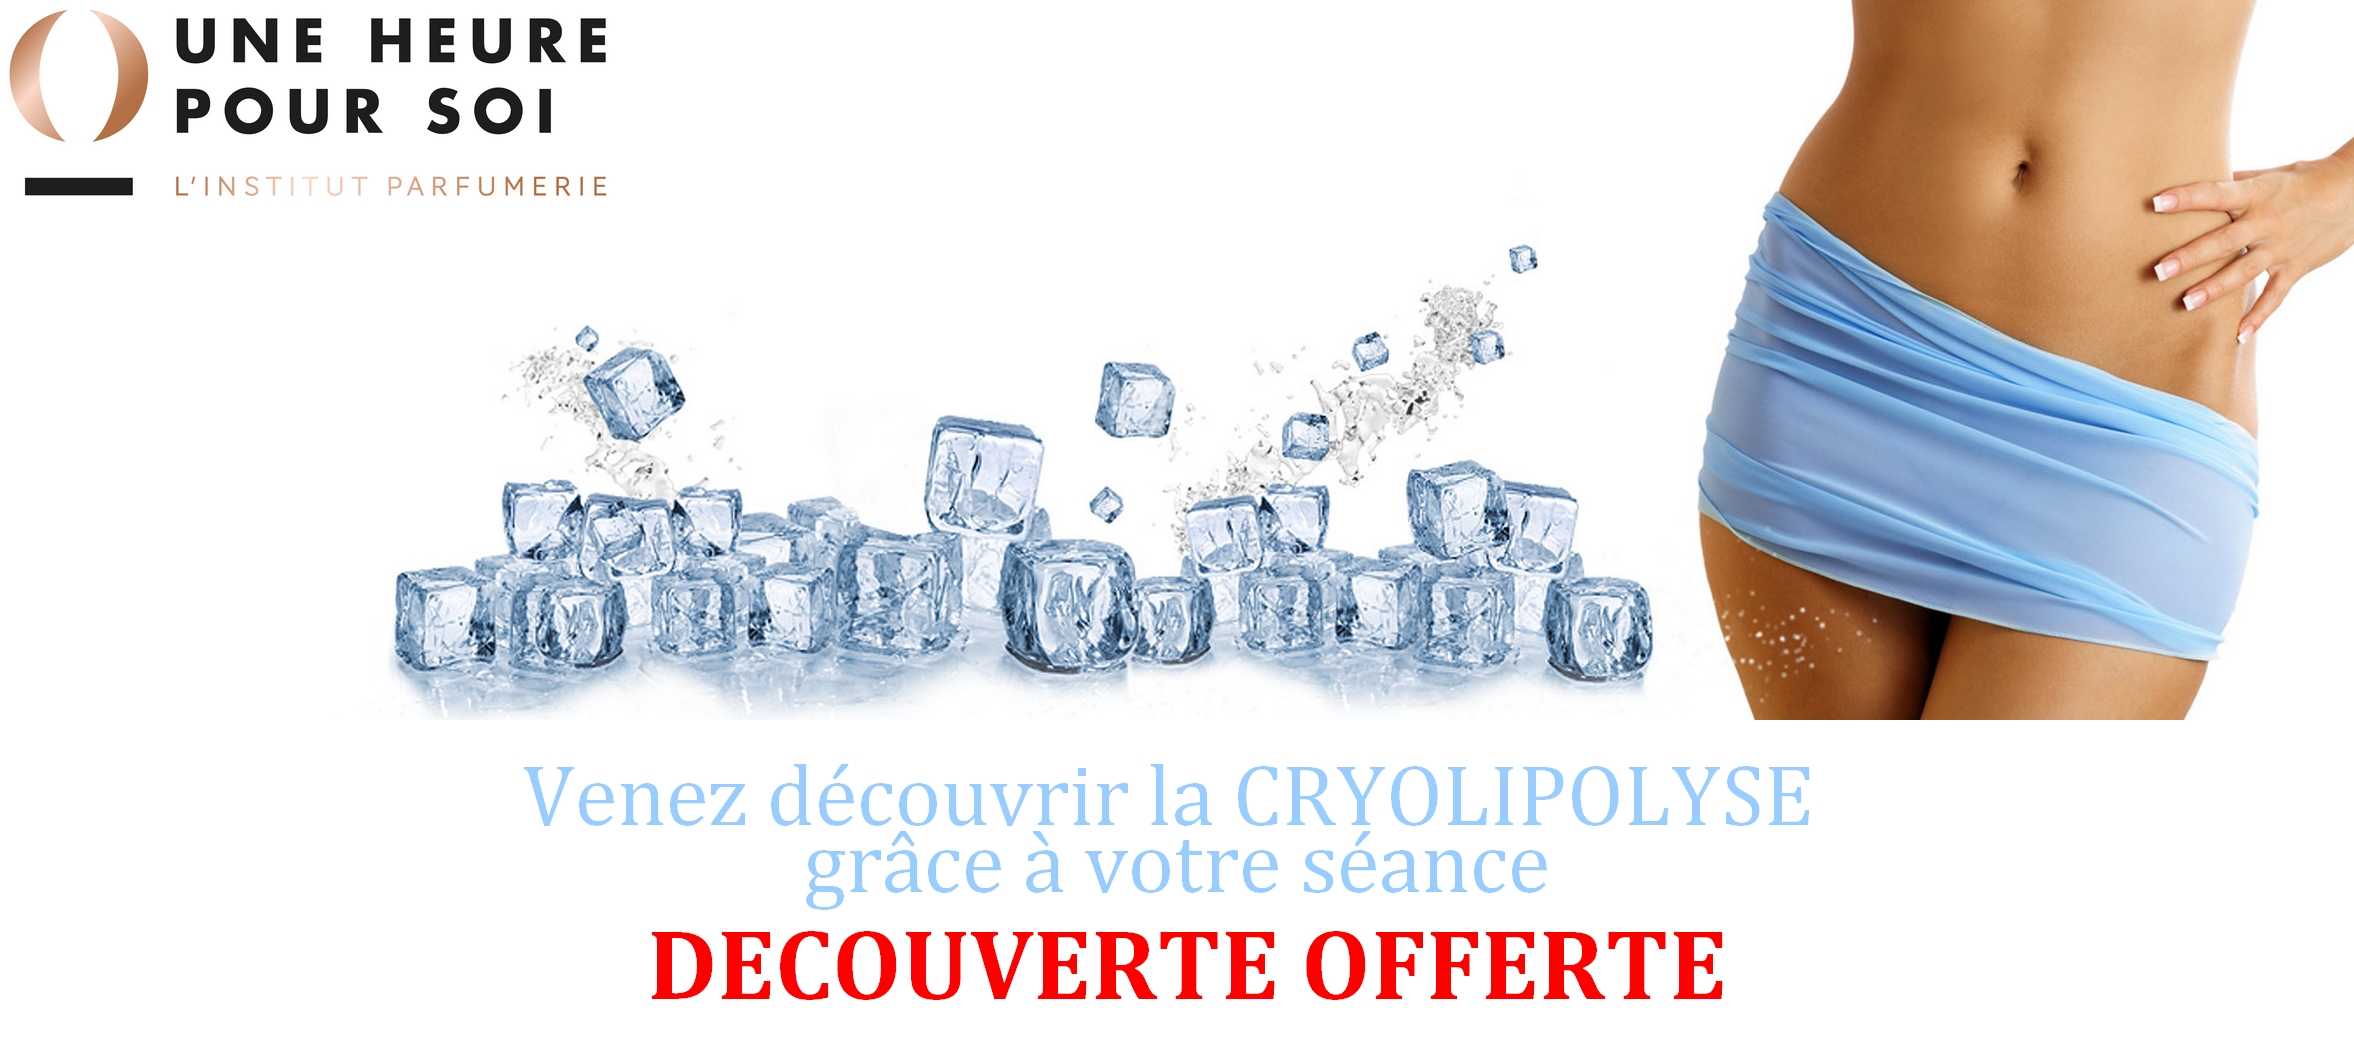 Cryo+fief+rose